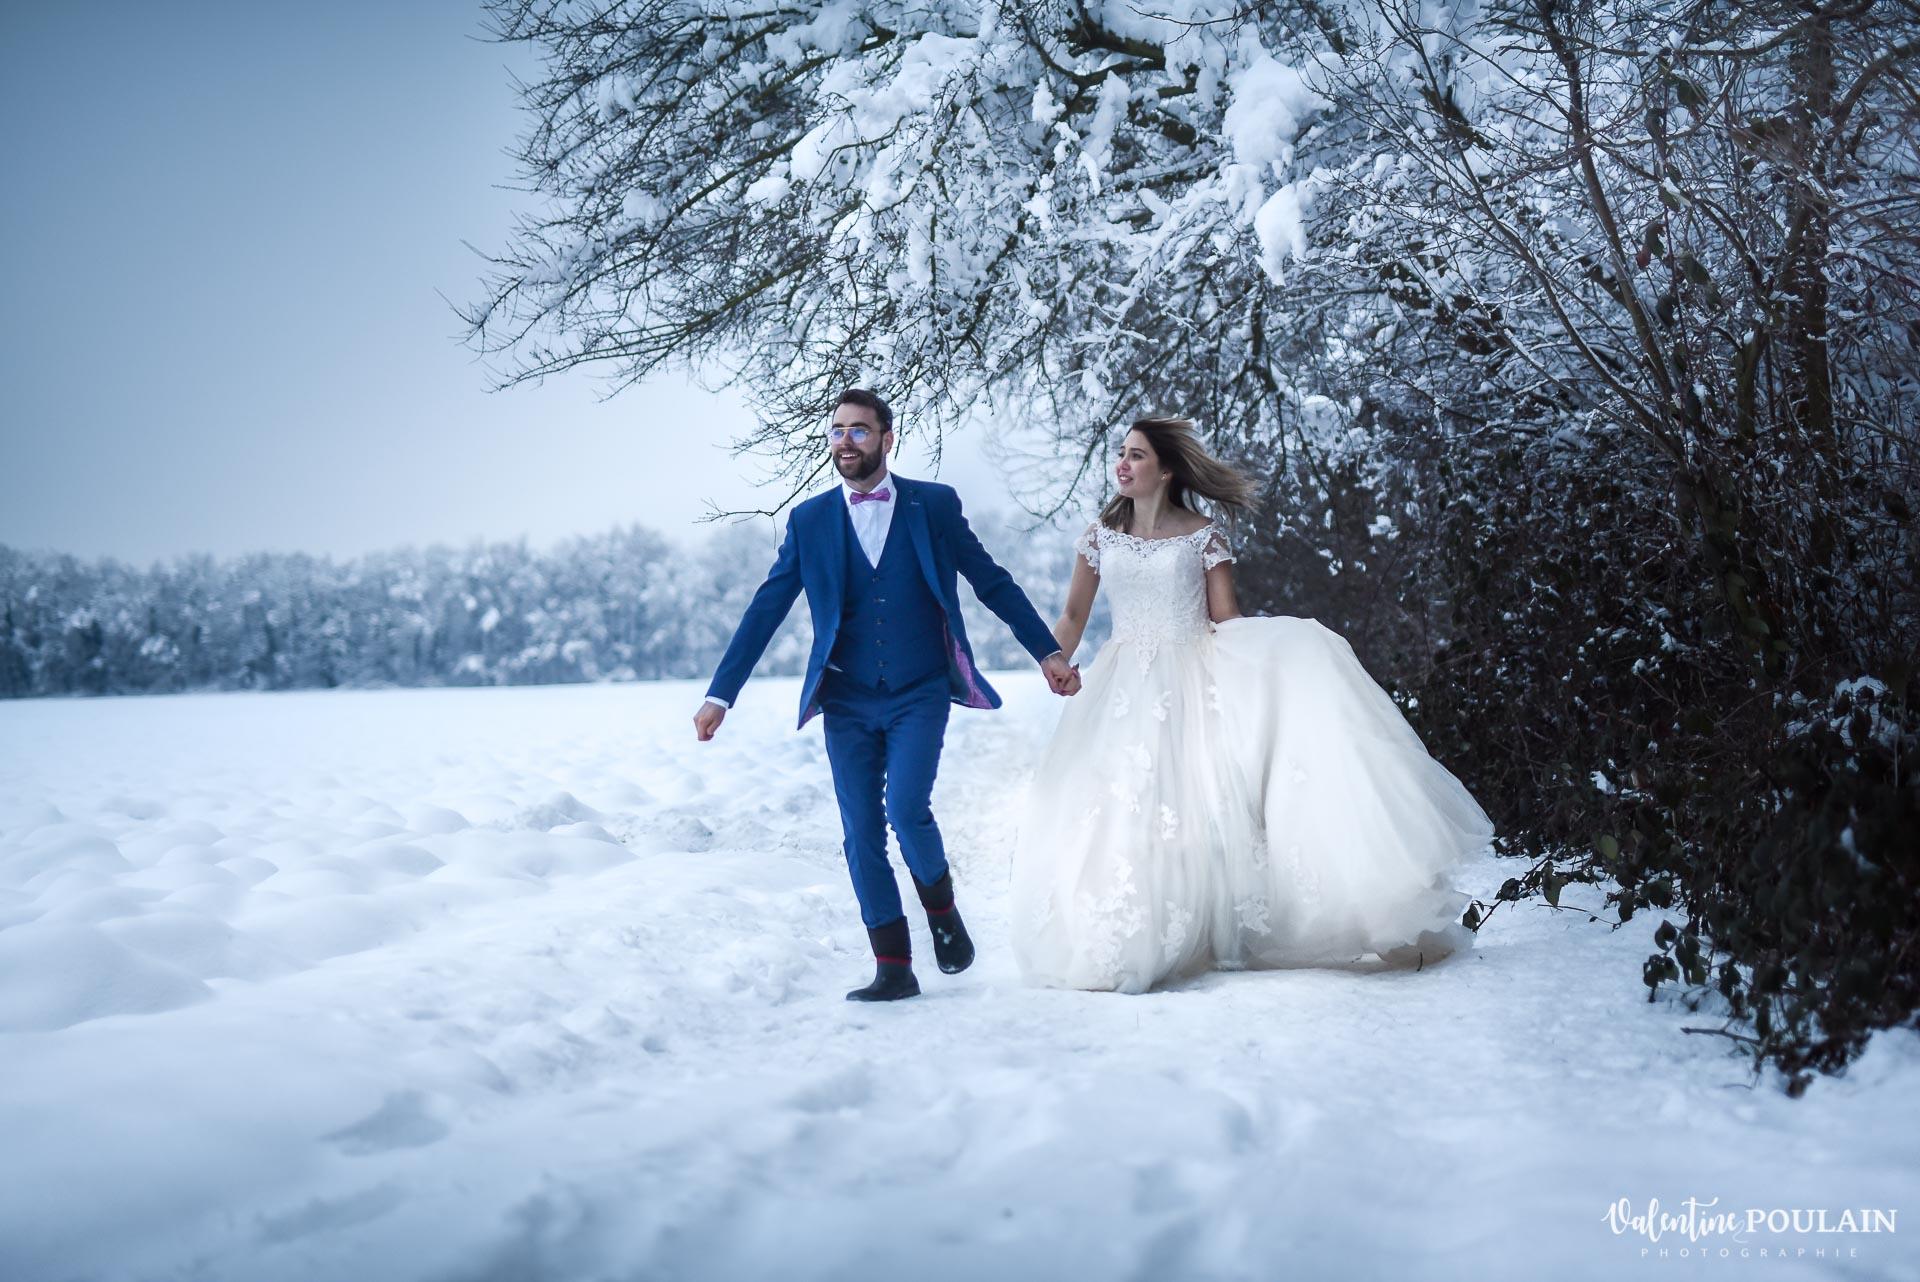 Photo mariage neige hiver - Valentine Poulain avancer